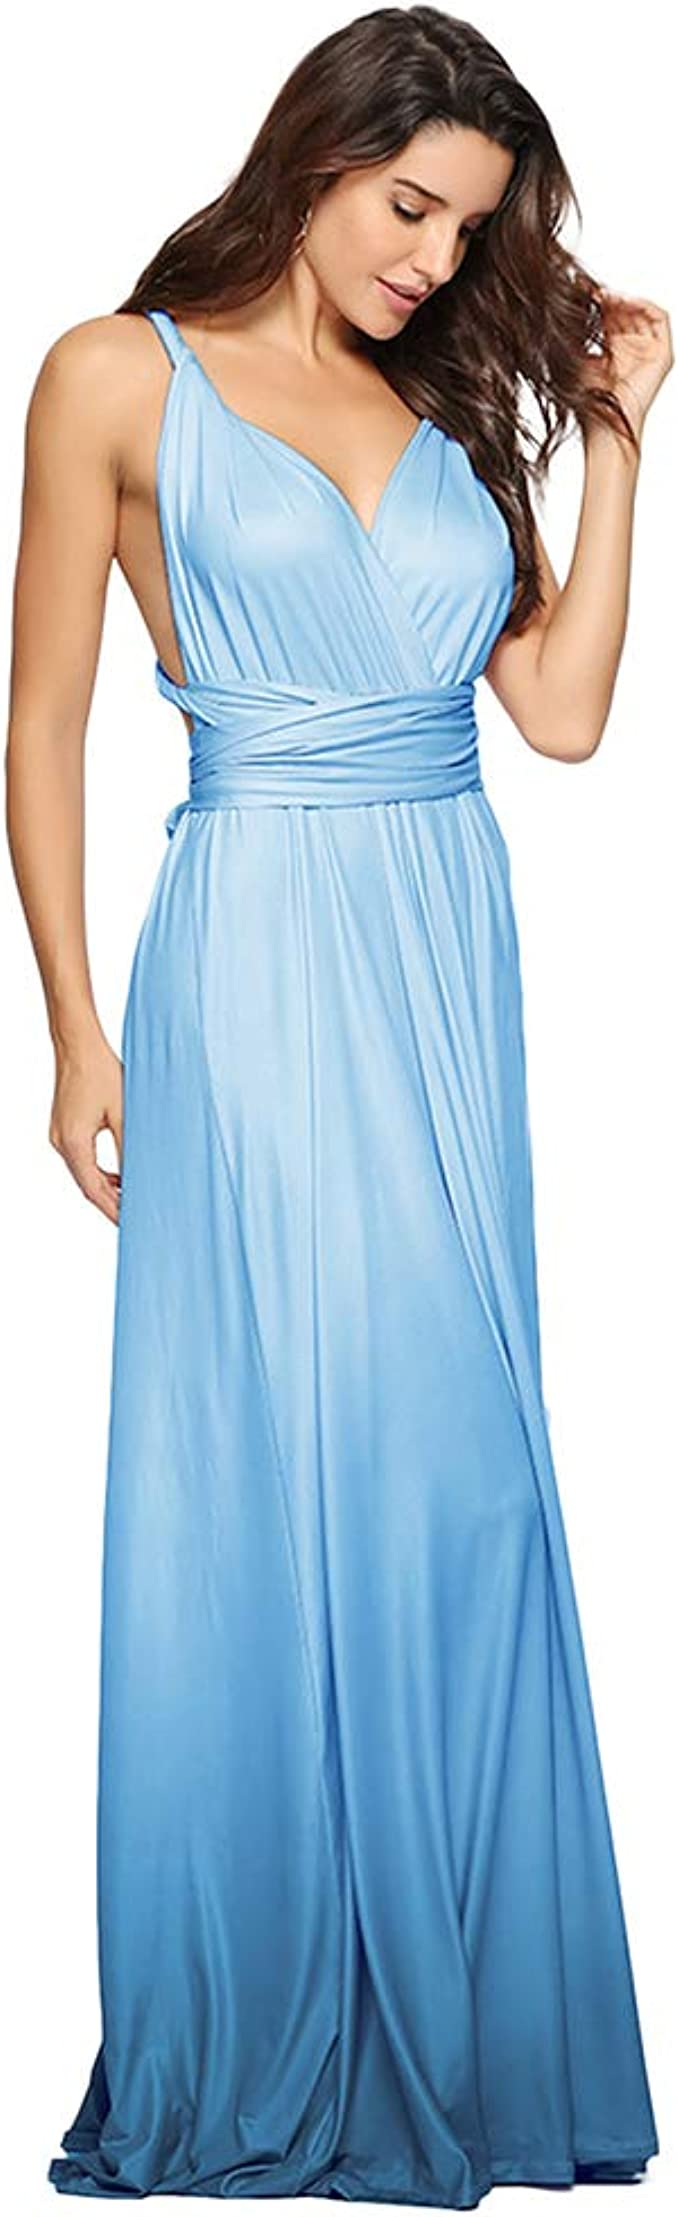 Lover Beauty Damen Elegant A Linie V Ausschnitt Chiffon Abendkleid Ballkleid Brautjungfernkleid Maxilang Blau S Amazon De Bekleidung